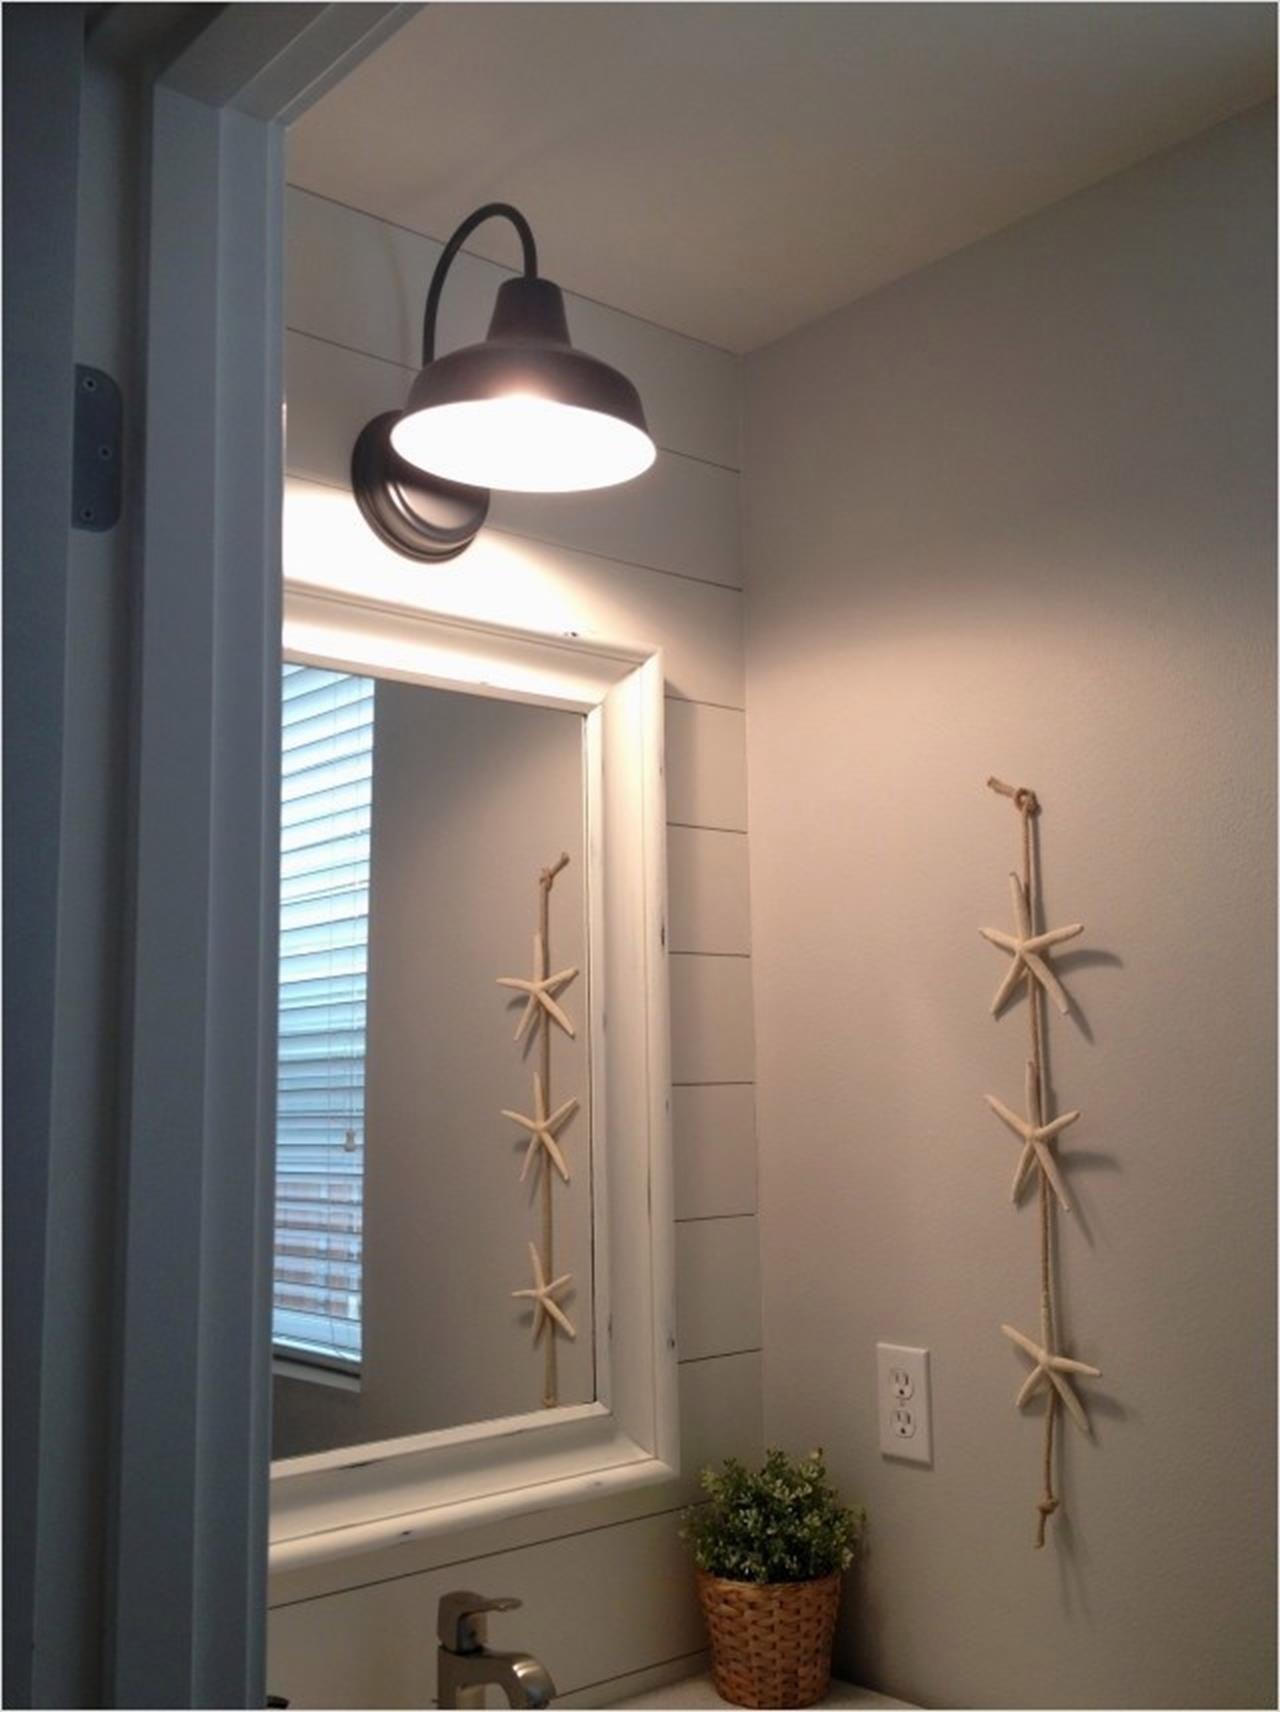 26 Inexpensive Farmhouse Bathroom Lighting Ideas You'll